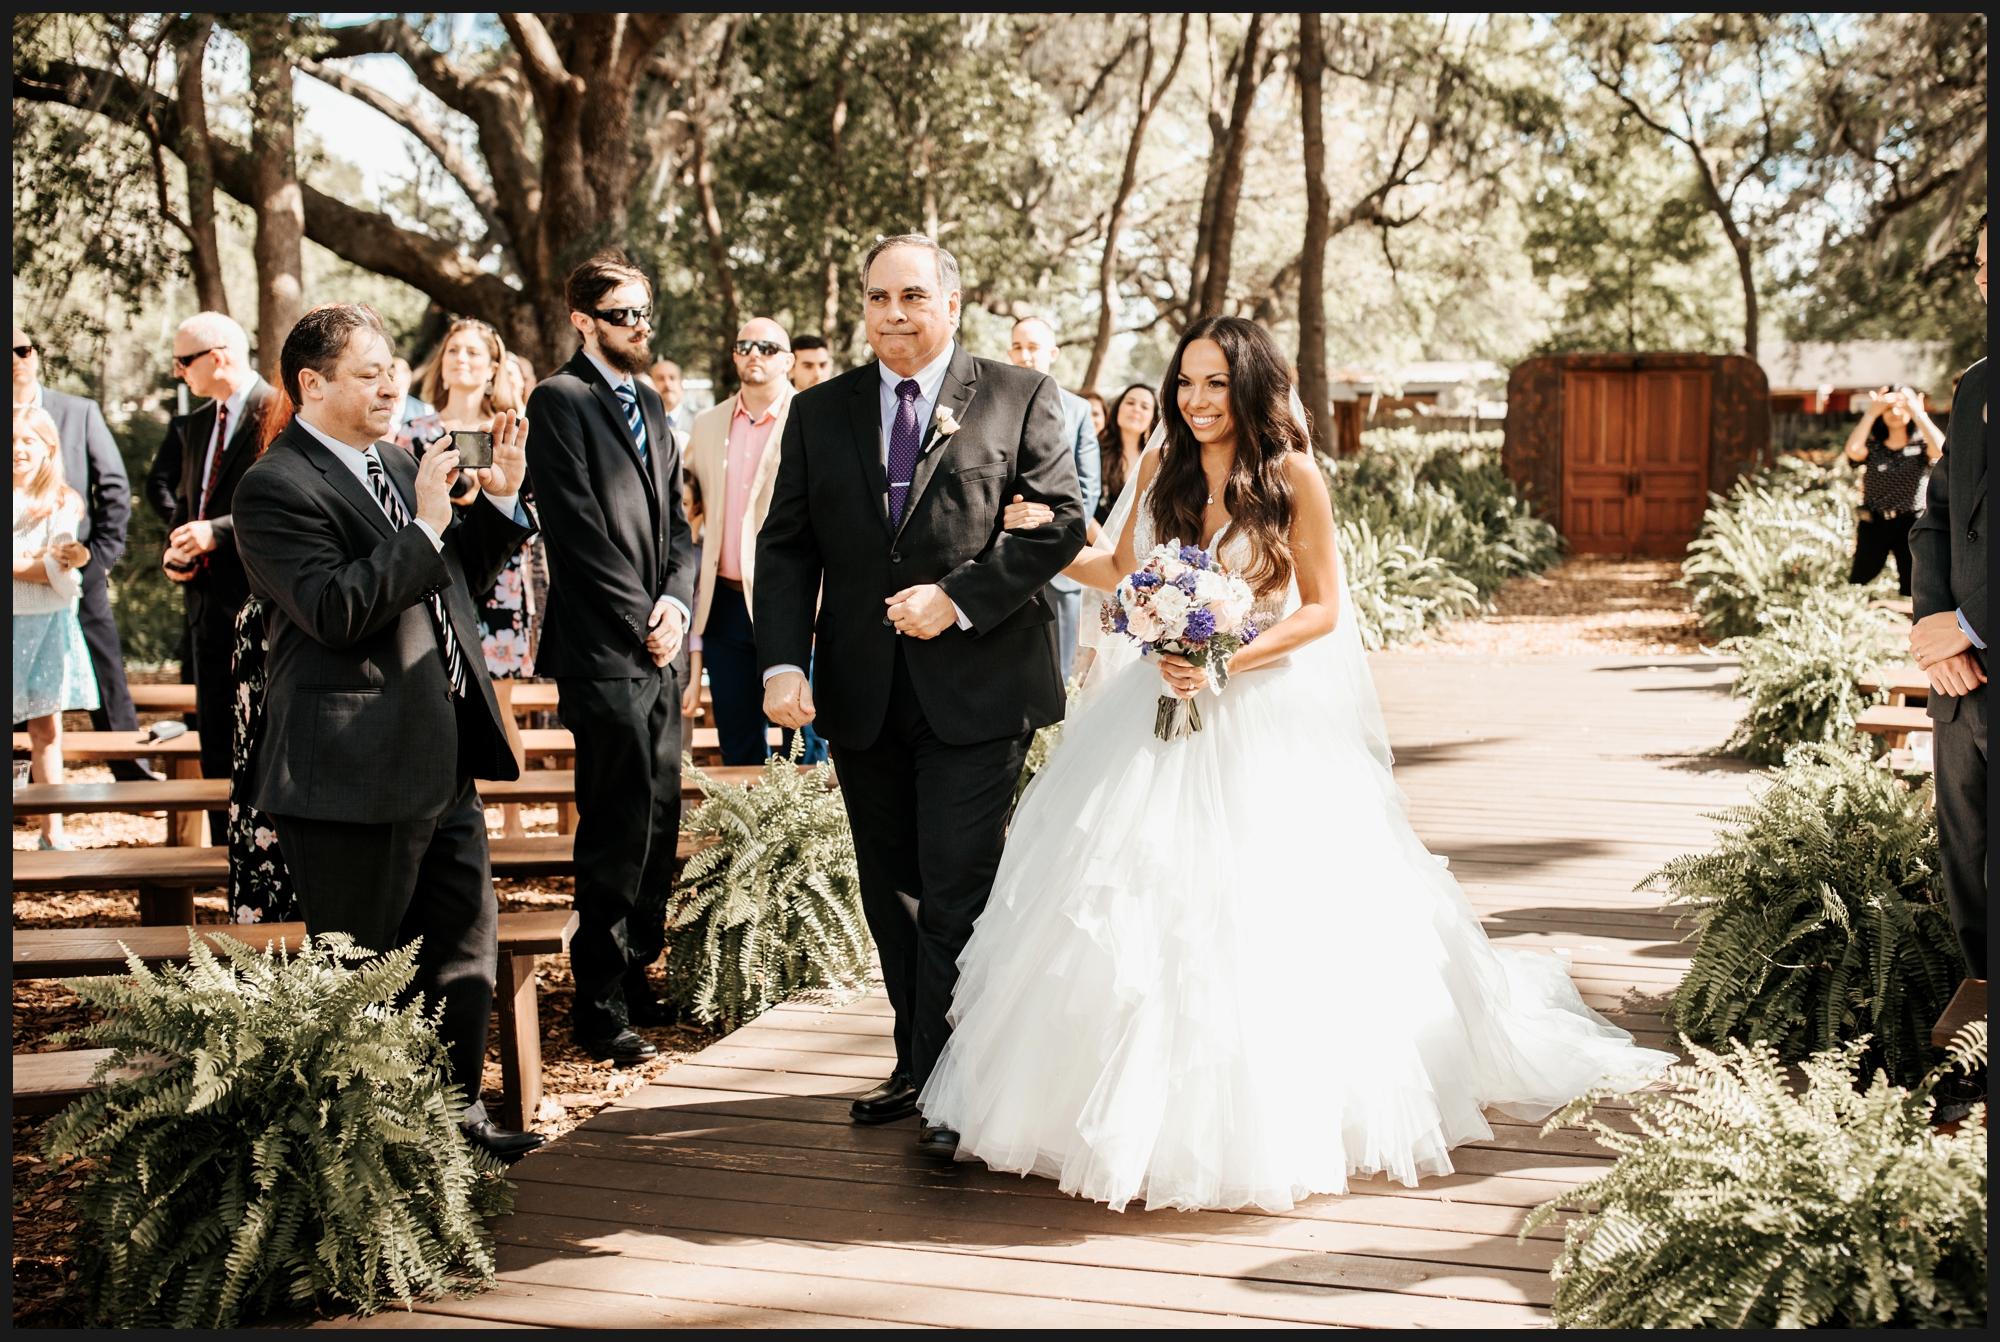 Orlando-Wedding-Photographer-destination-wedding-photographer-florida-wedding-photographer-bohemian-wedding-photographer_1610.jpg